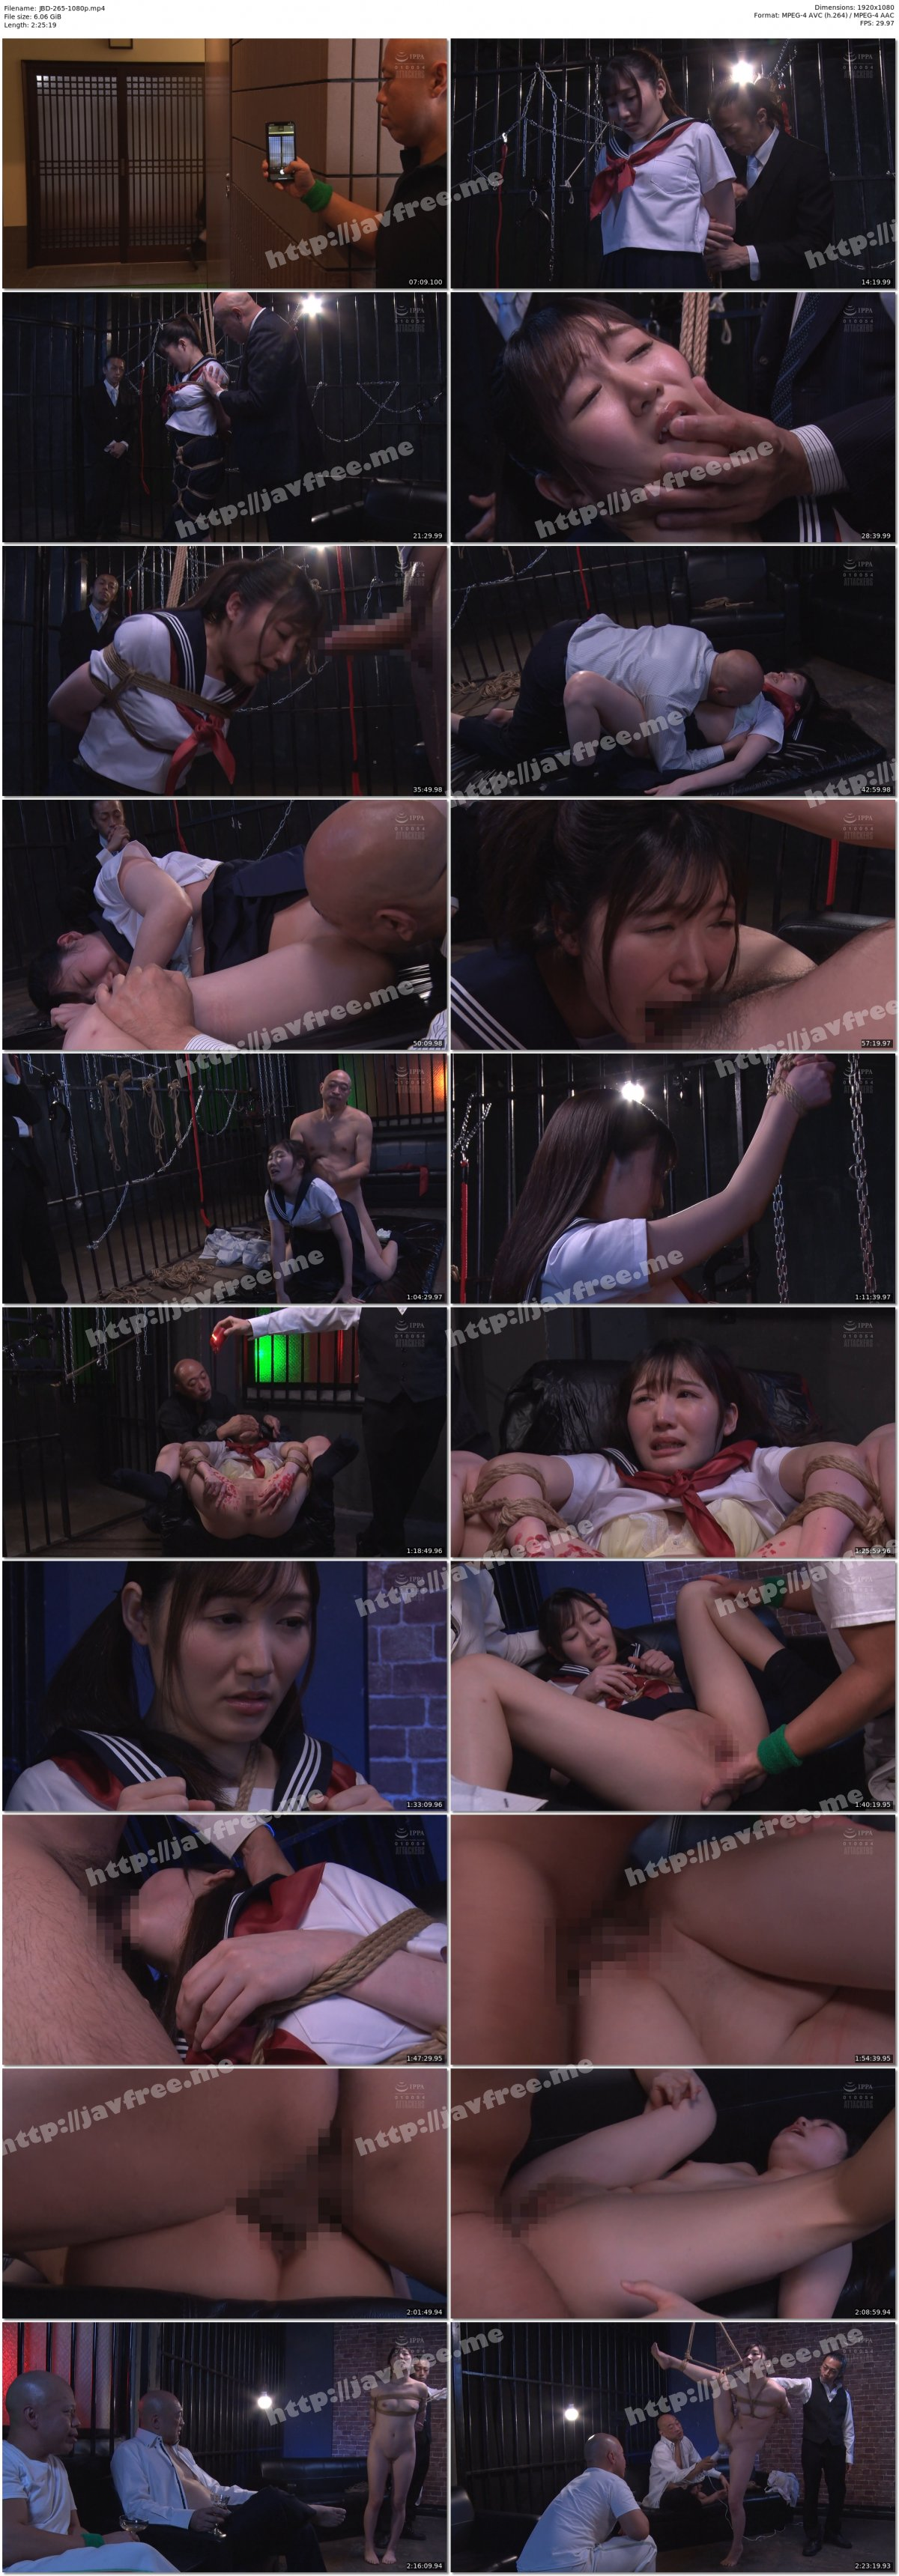 [HD][JBD-265] 女子●生 蛇縛輪●十四 武田エレナ - image JBD-265-1080p on https://javfree.me